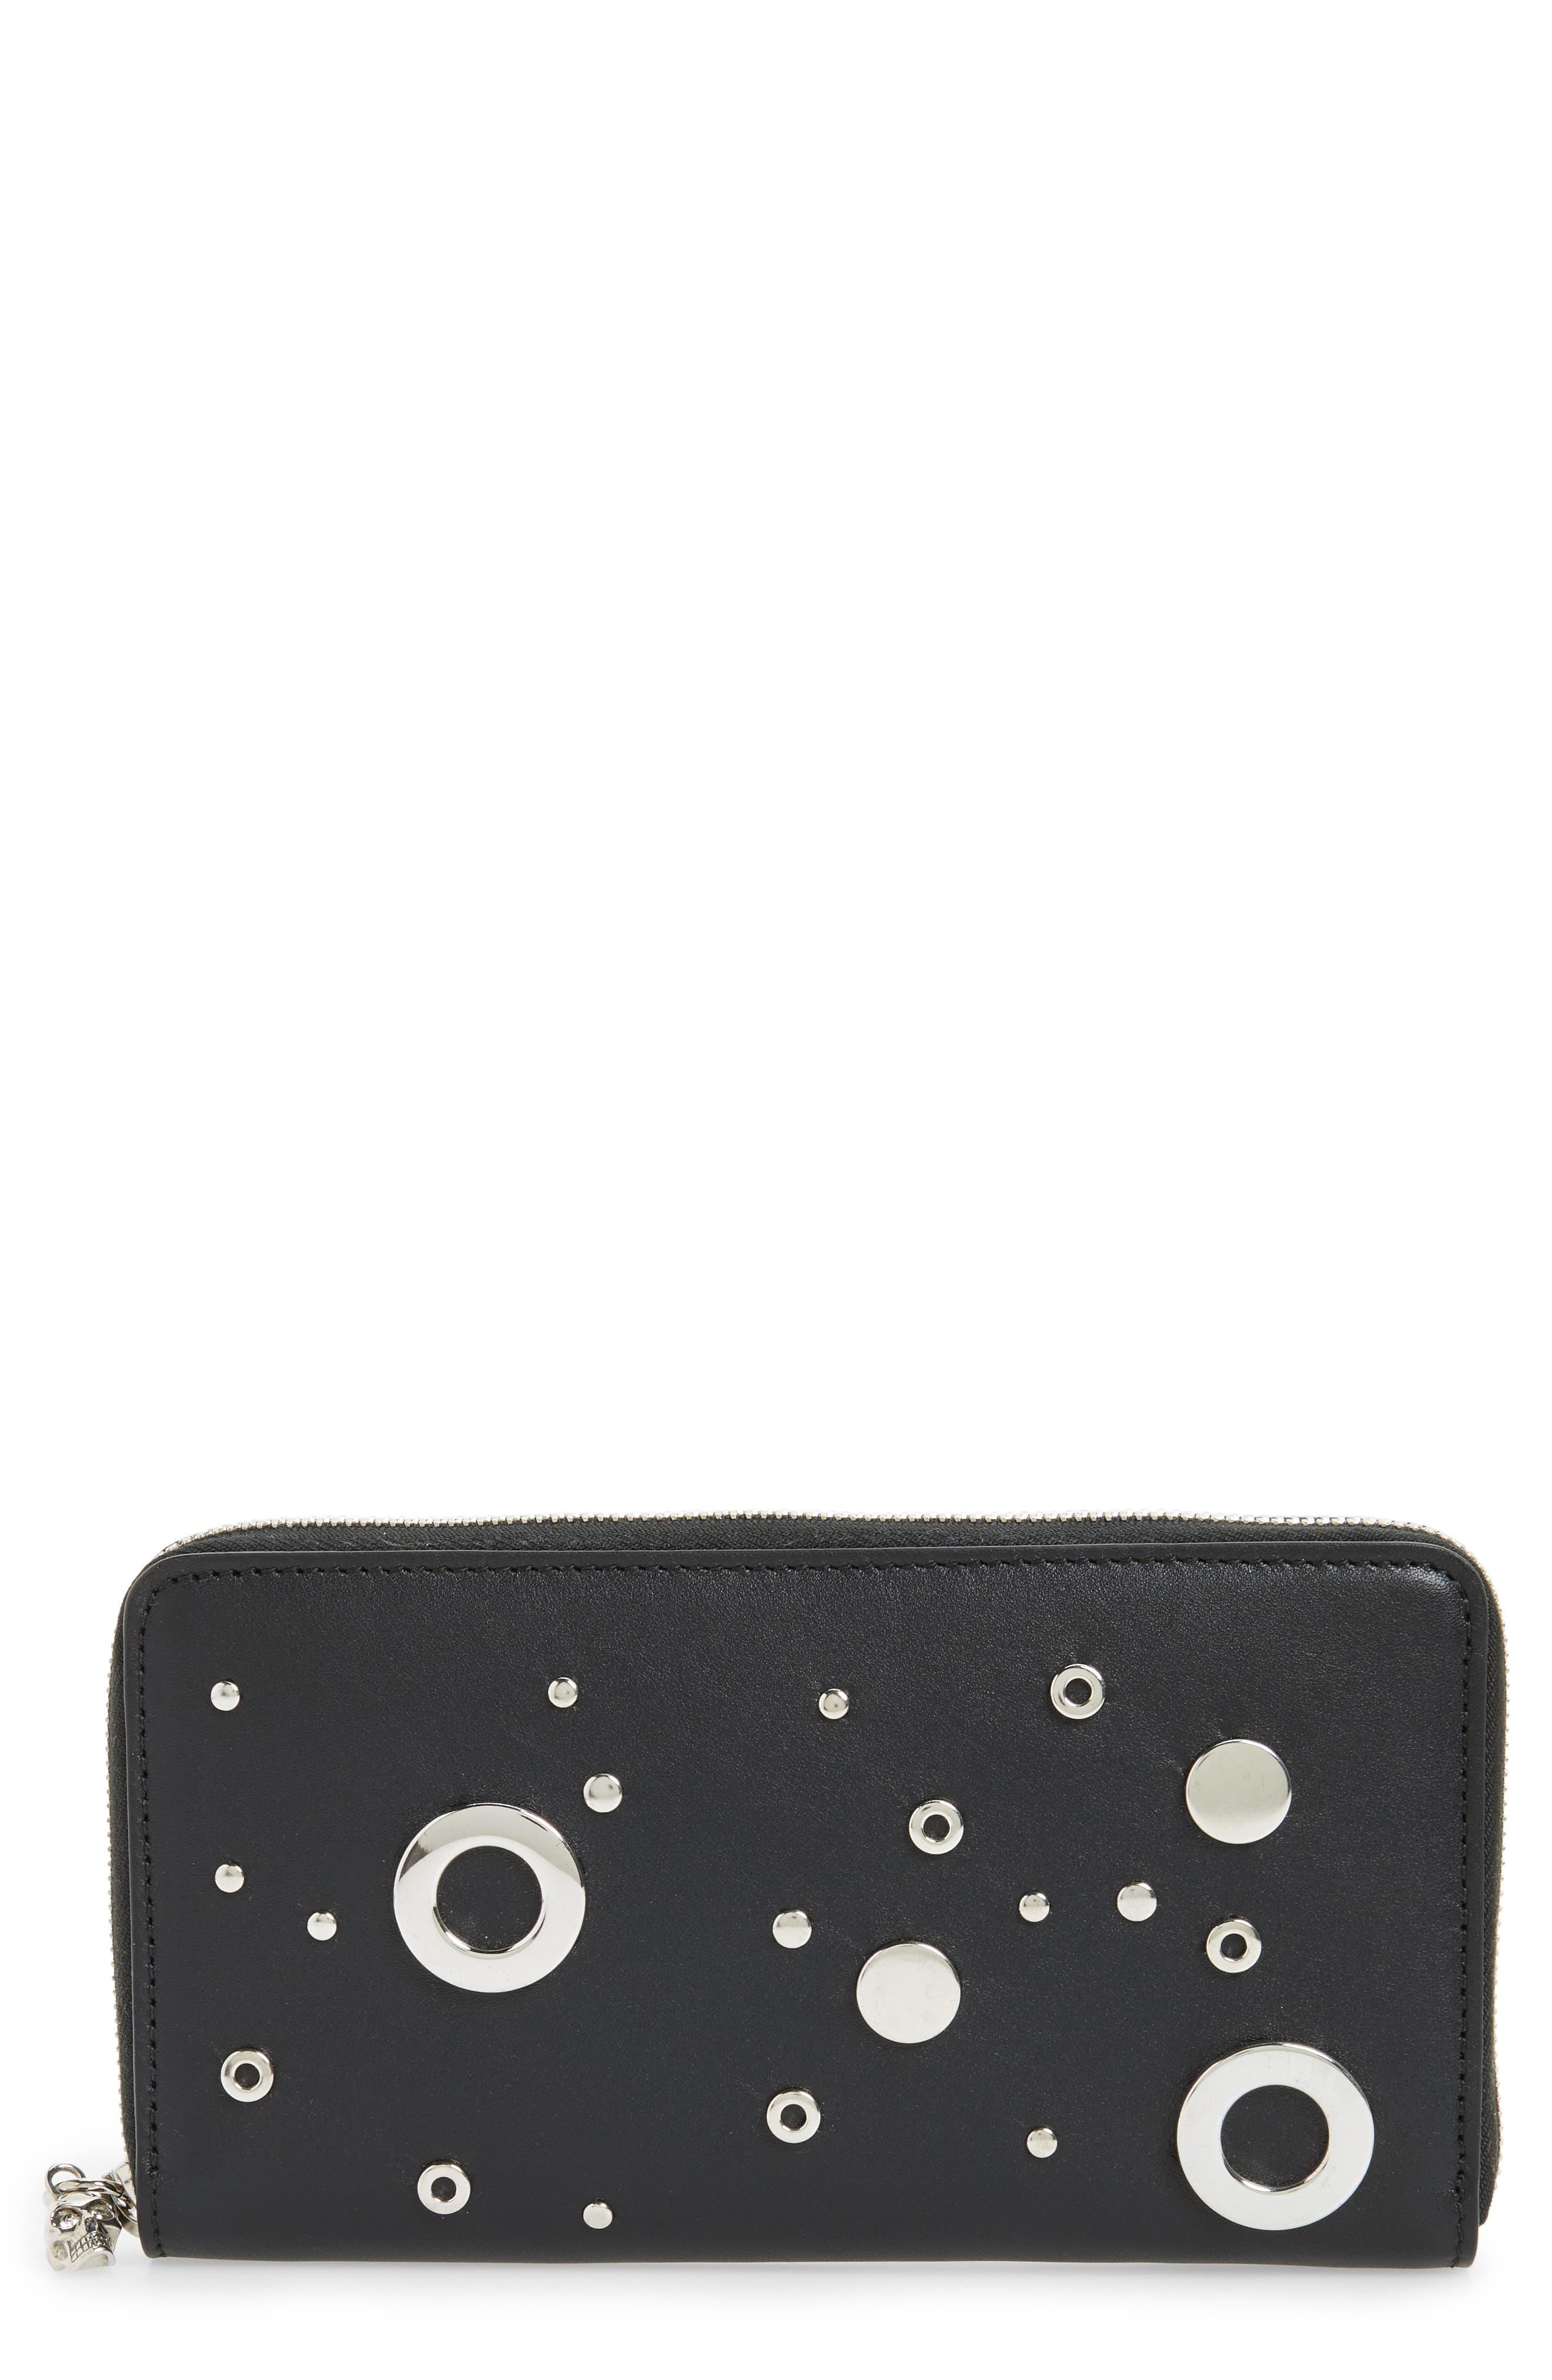 Main Image - Alexander McQueen Grommet & Stud Calfskin Leather Continental Wallet